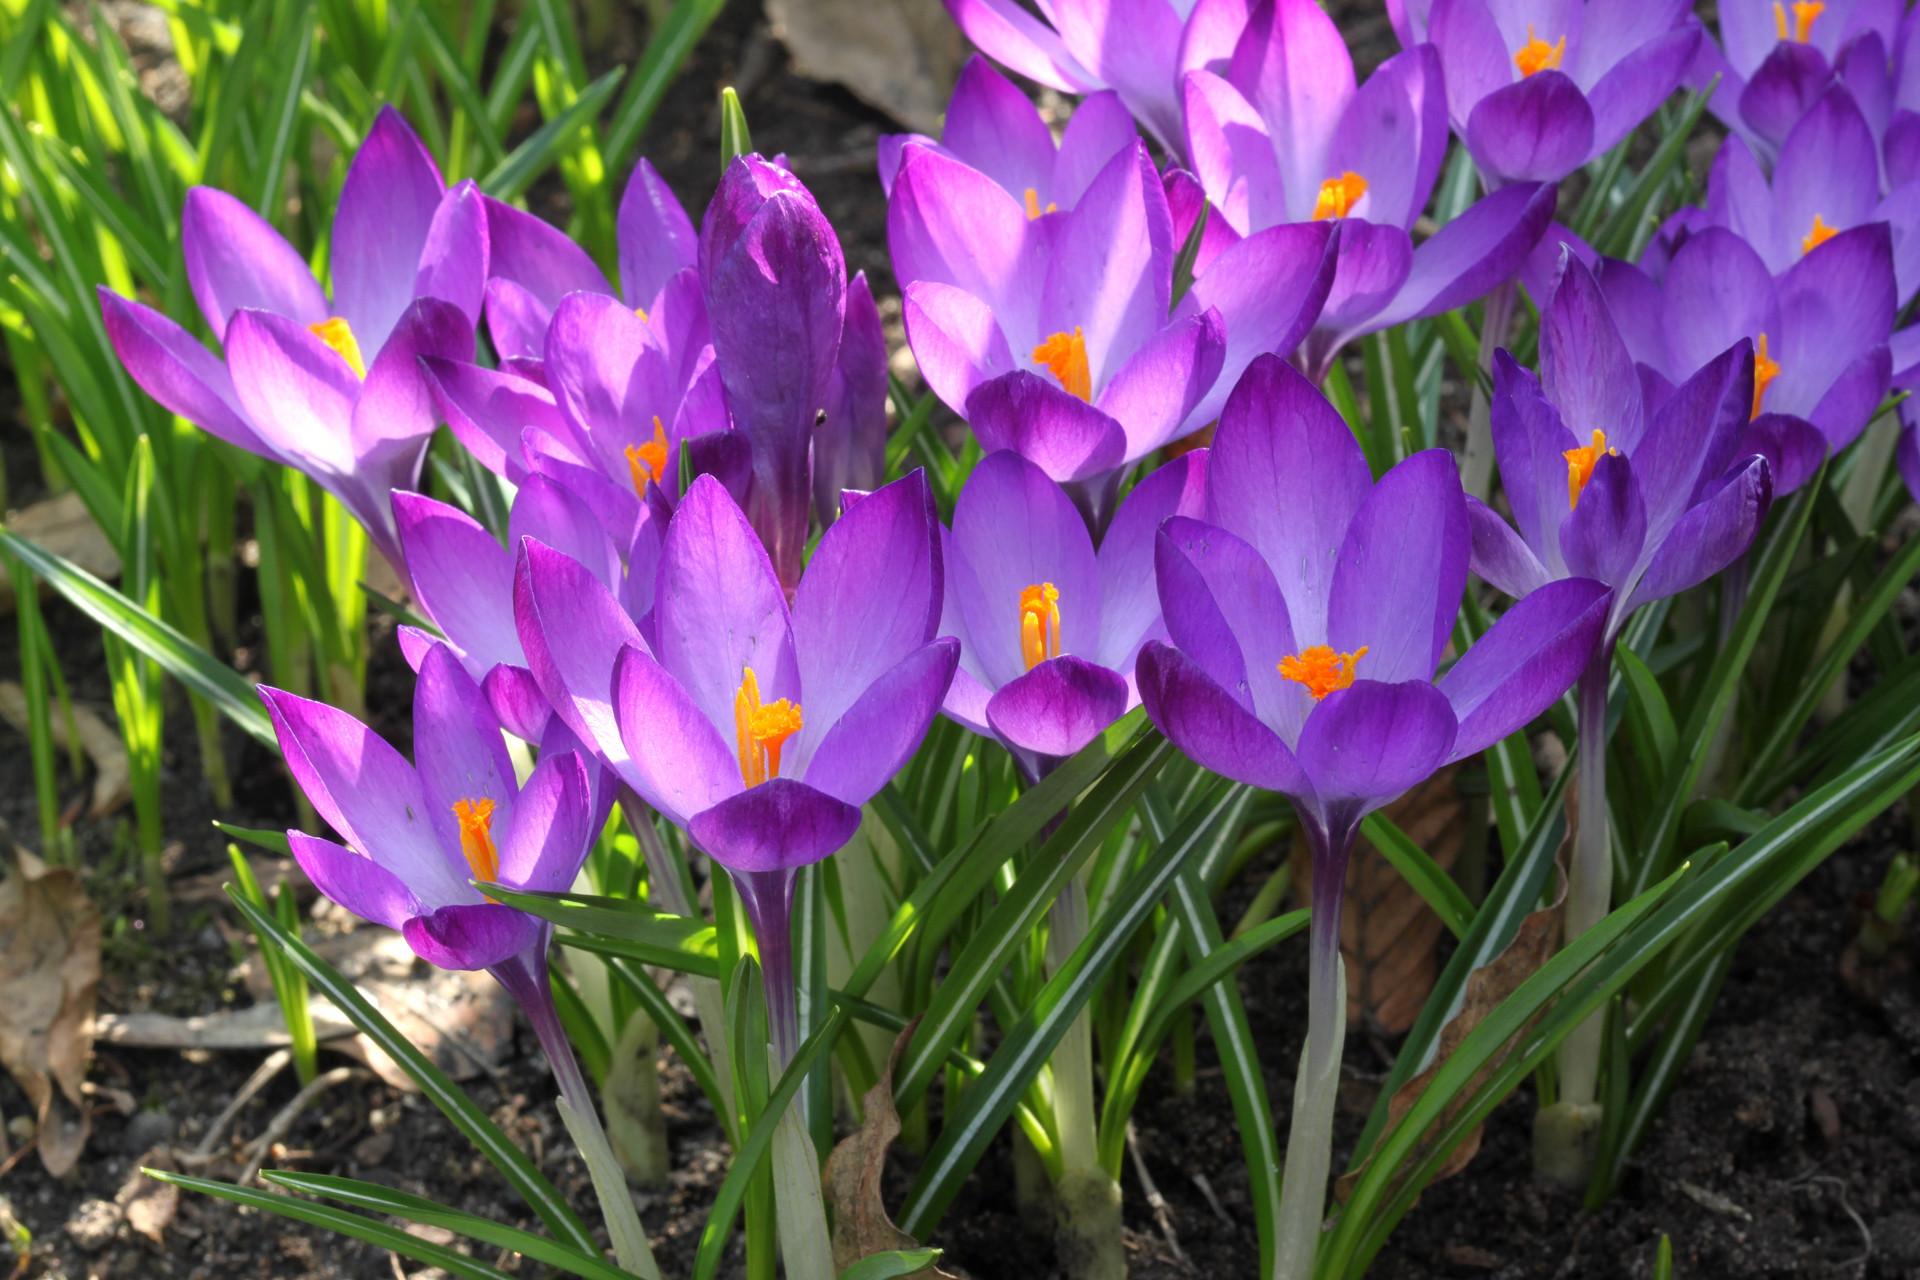 Res: 1920x1280, Free Desktop Wallpapers Spring Flowers - Wallpaper Cave